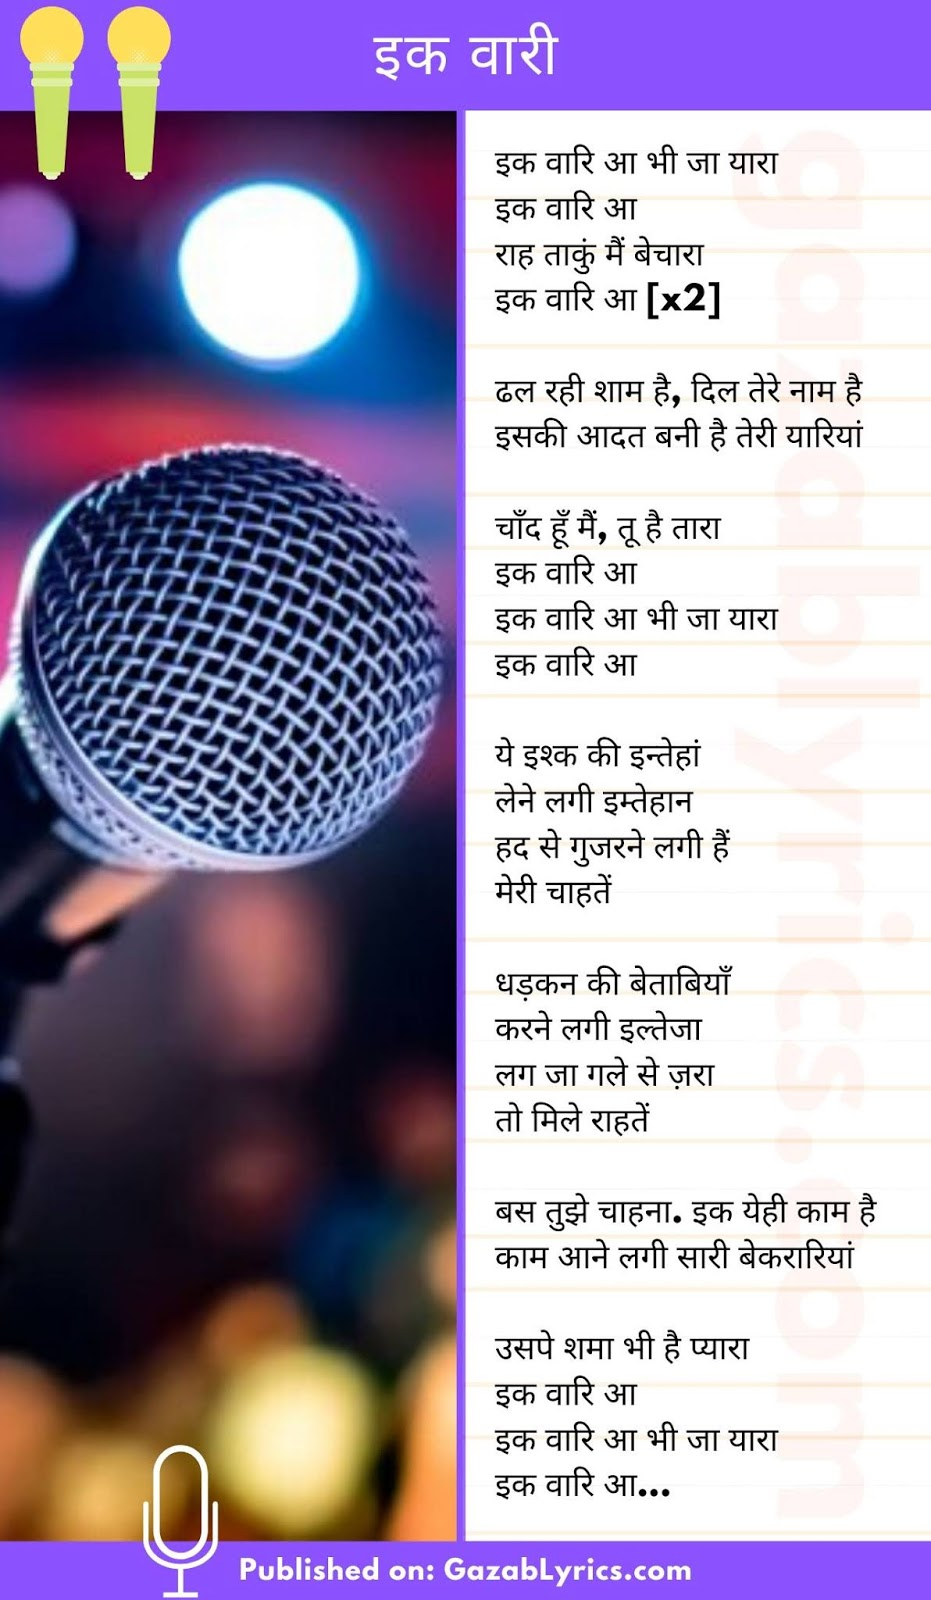 Ik Vaari song lyrics image